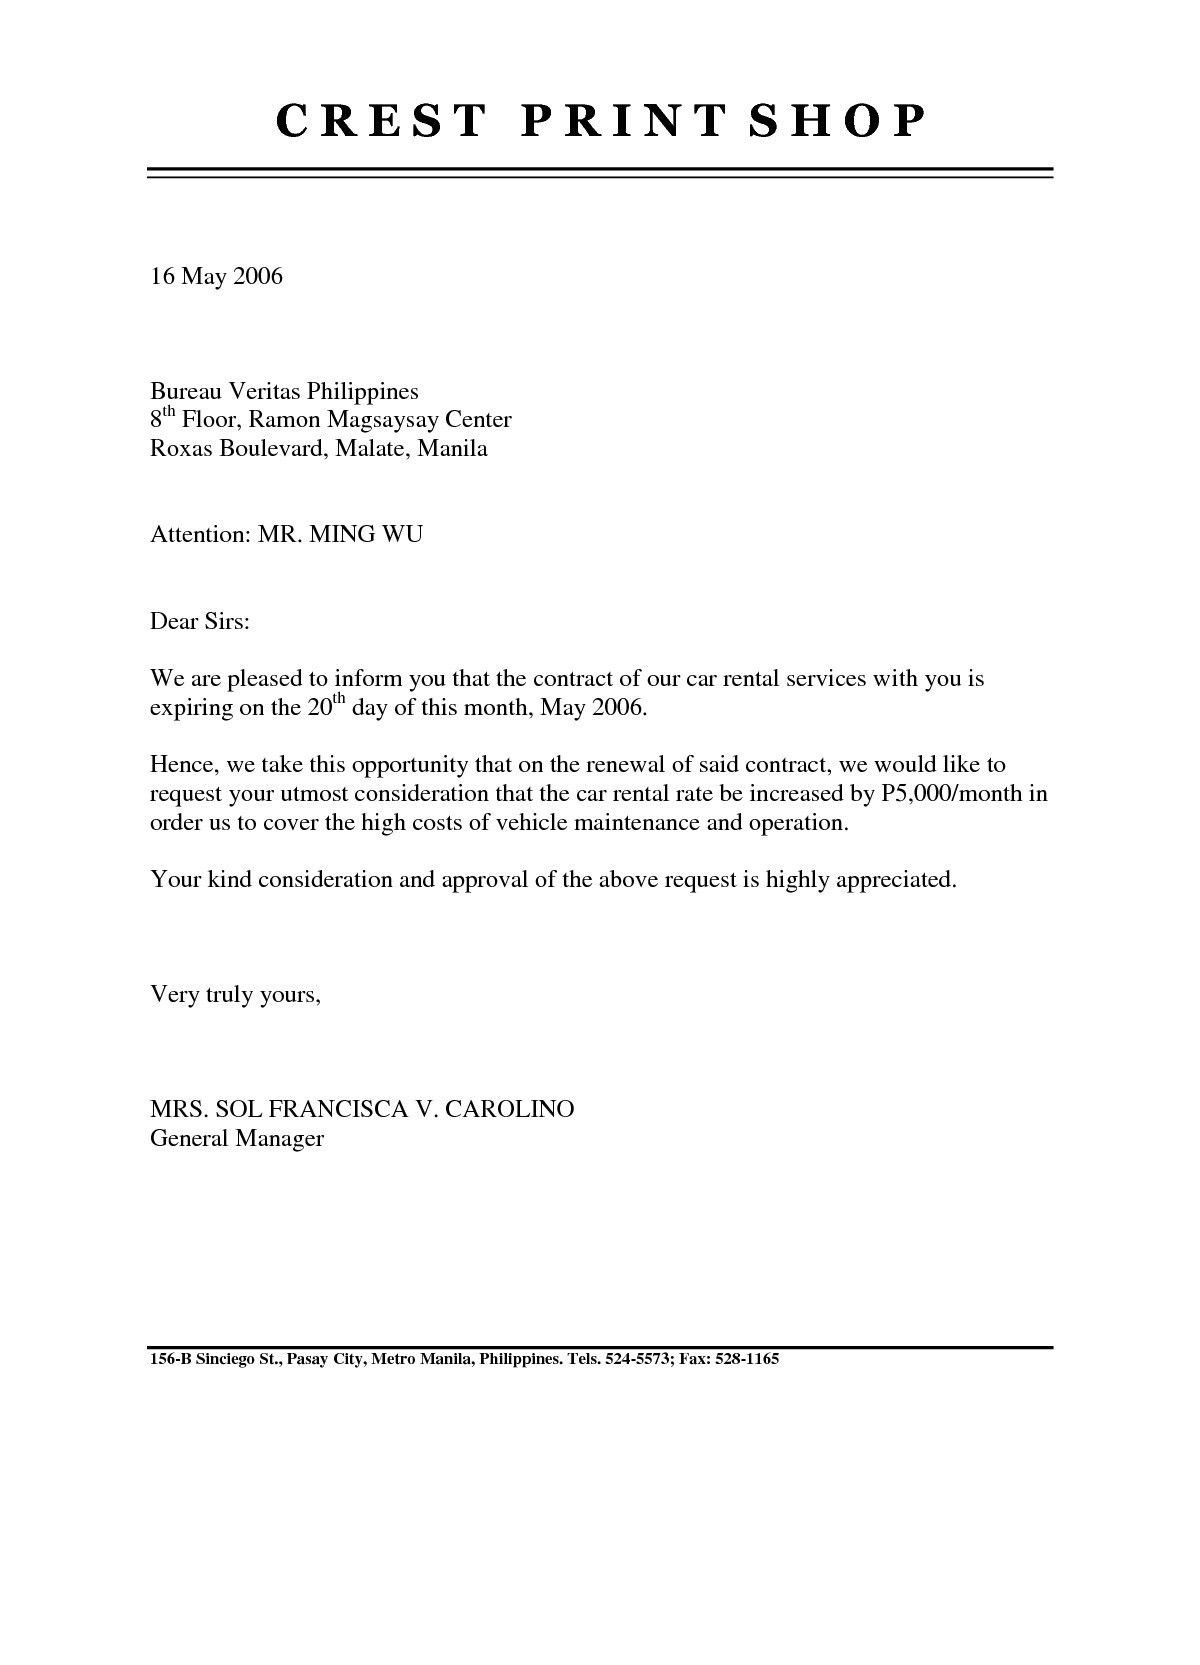 Download Lettersample Letterformat Resumesample Resumeformat